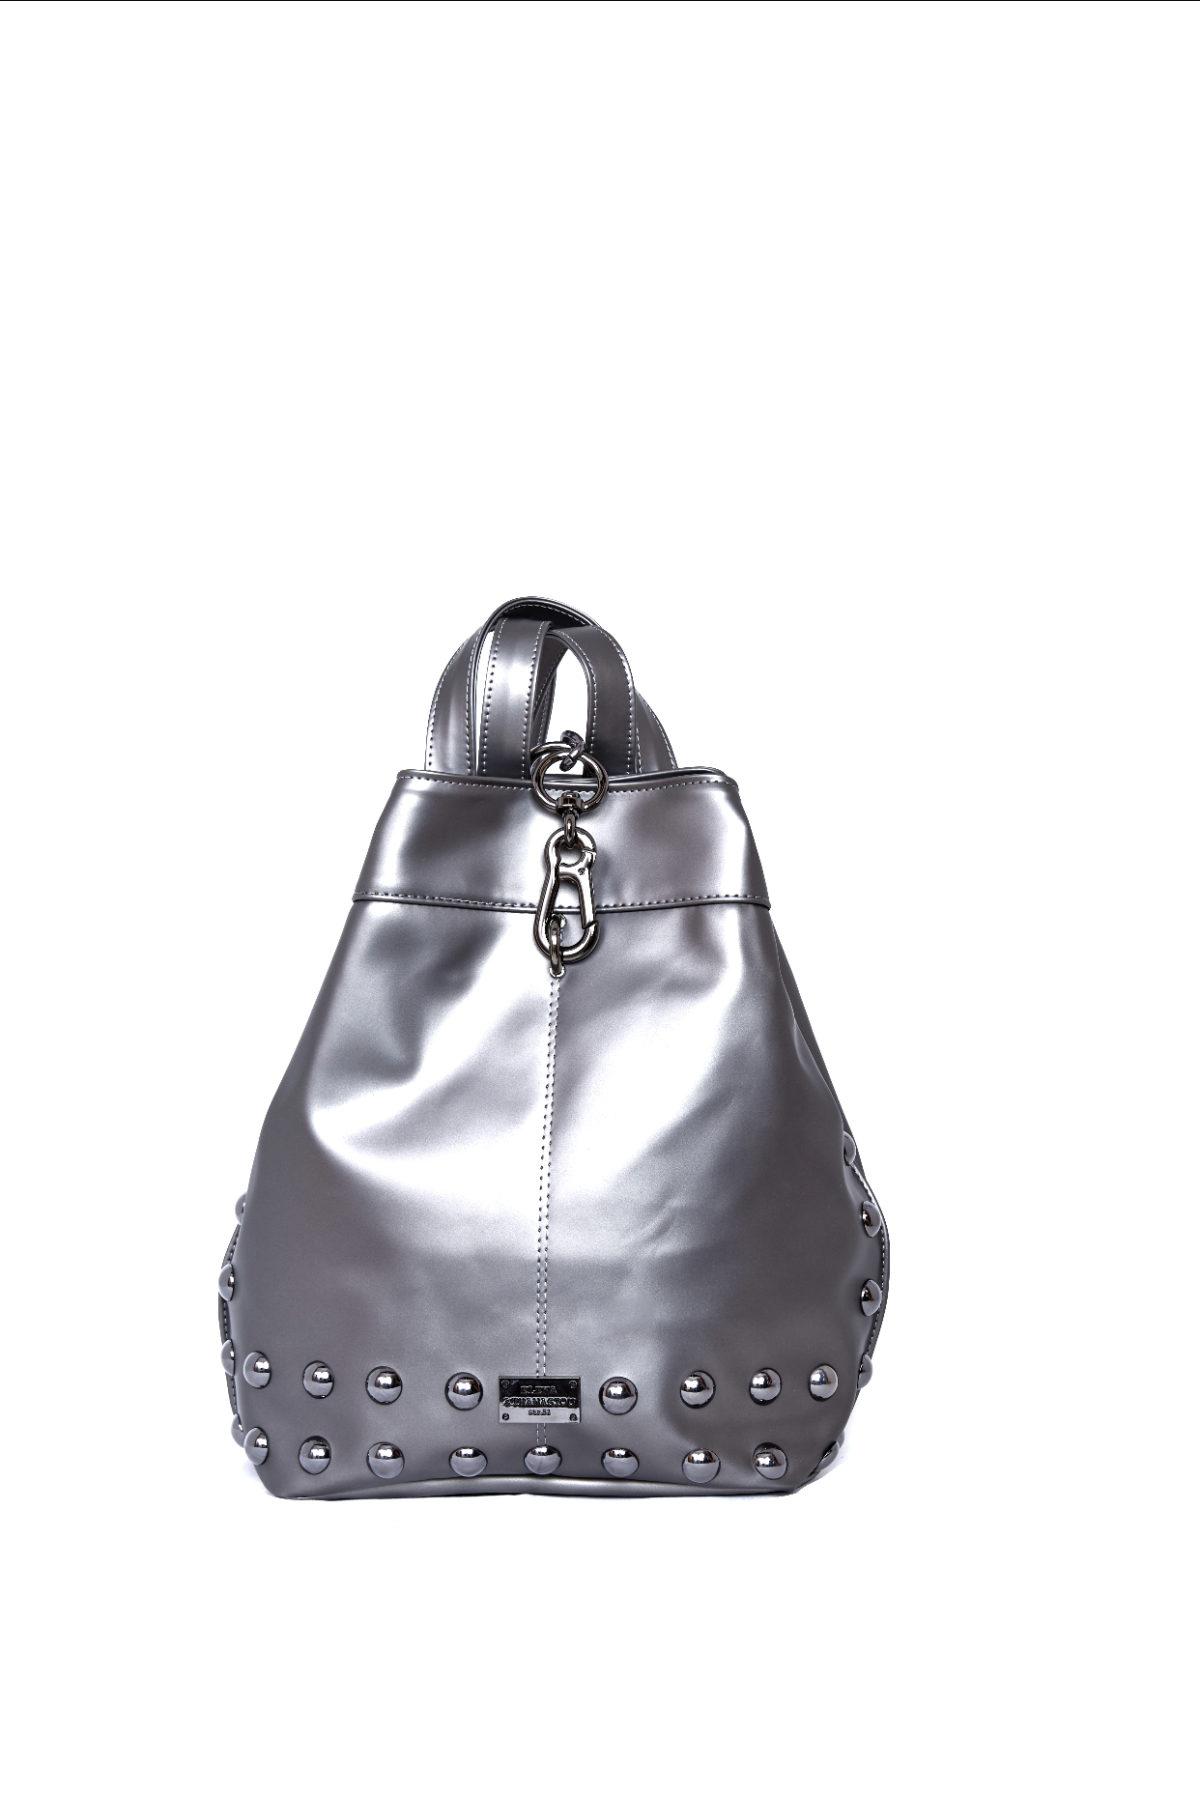 elena athanasiou bags backpack metallic grey